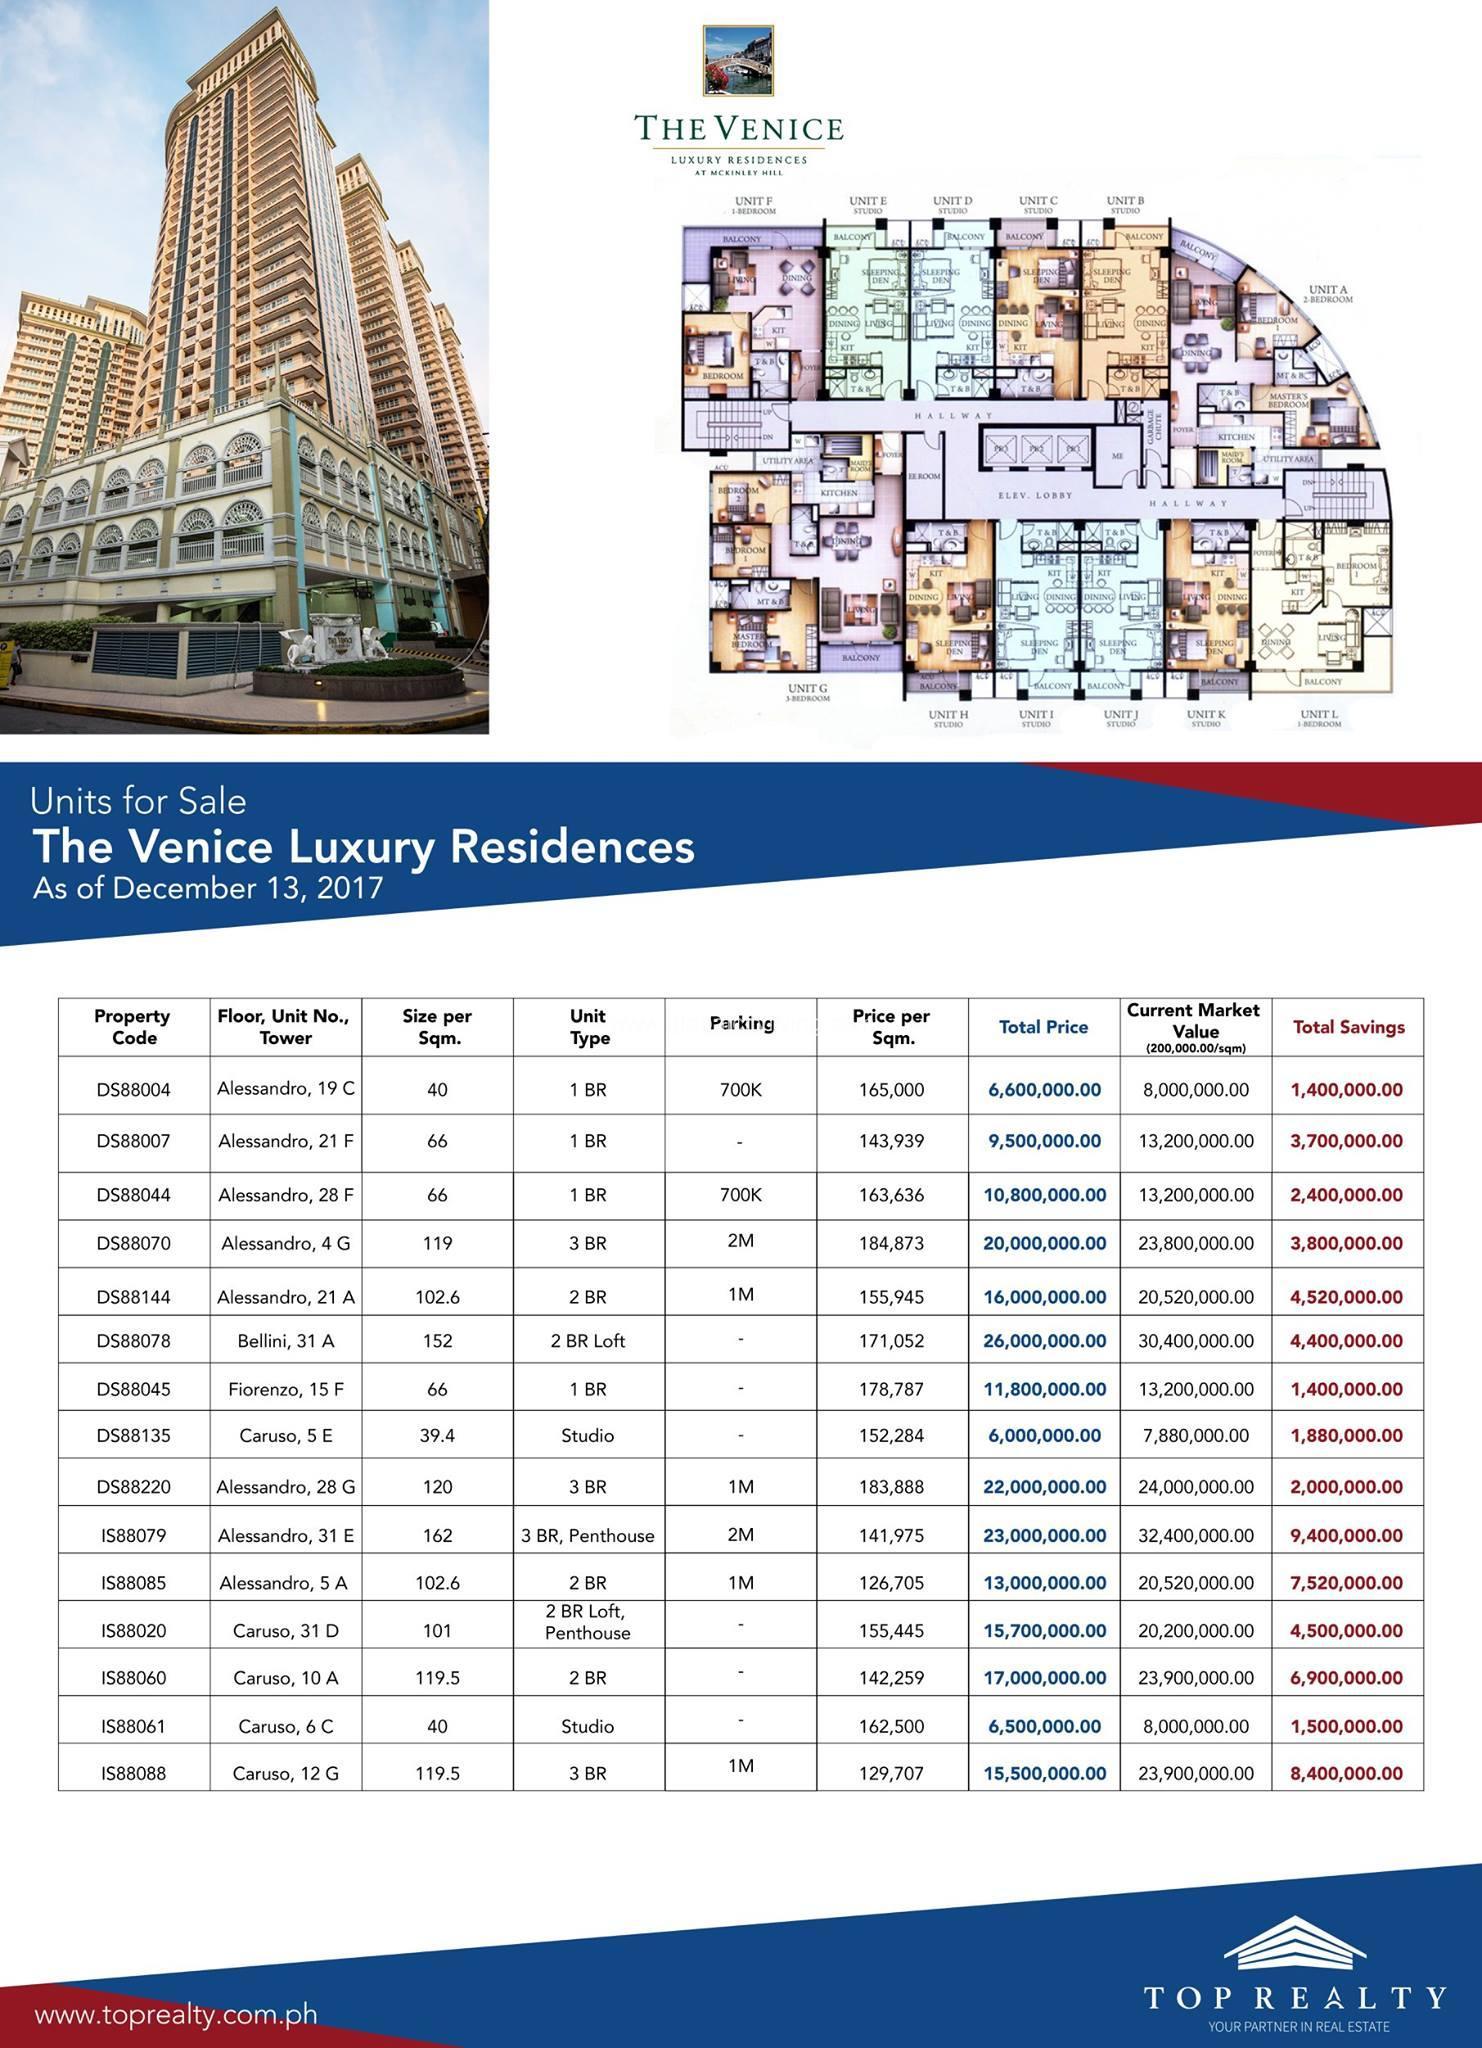 the venice luxury residences price list fort bonifacio global city taguig